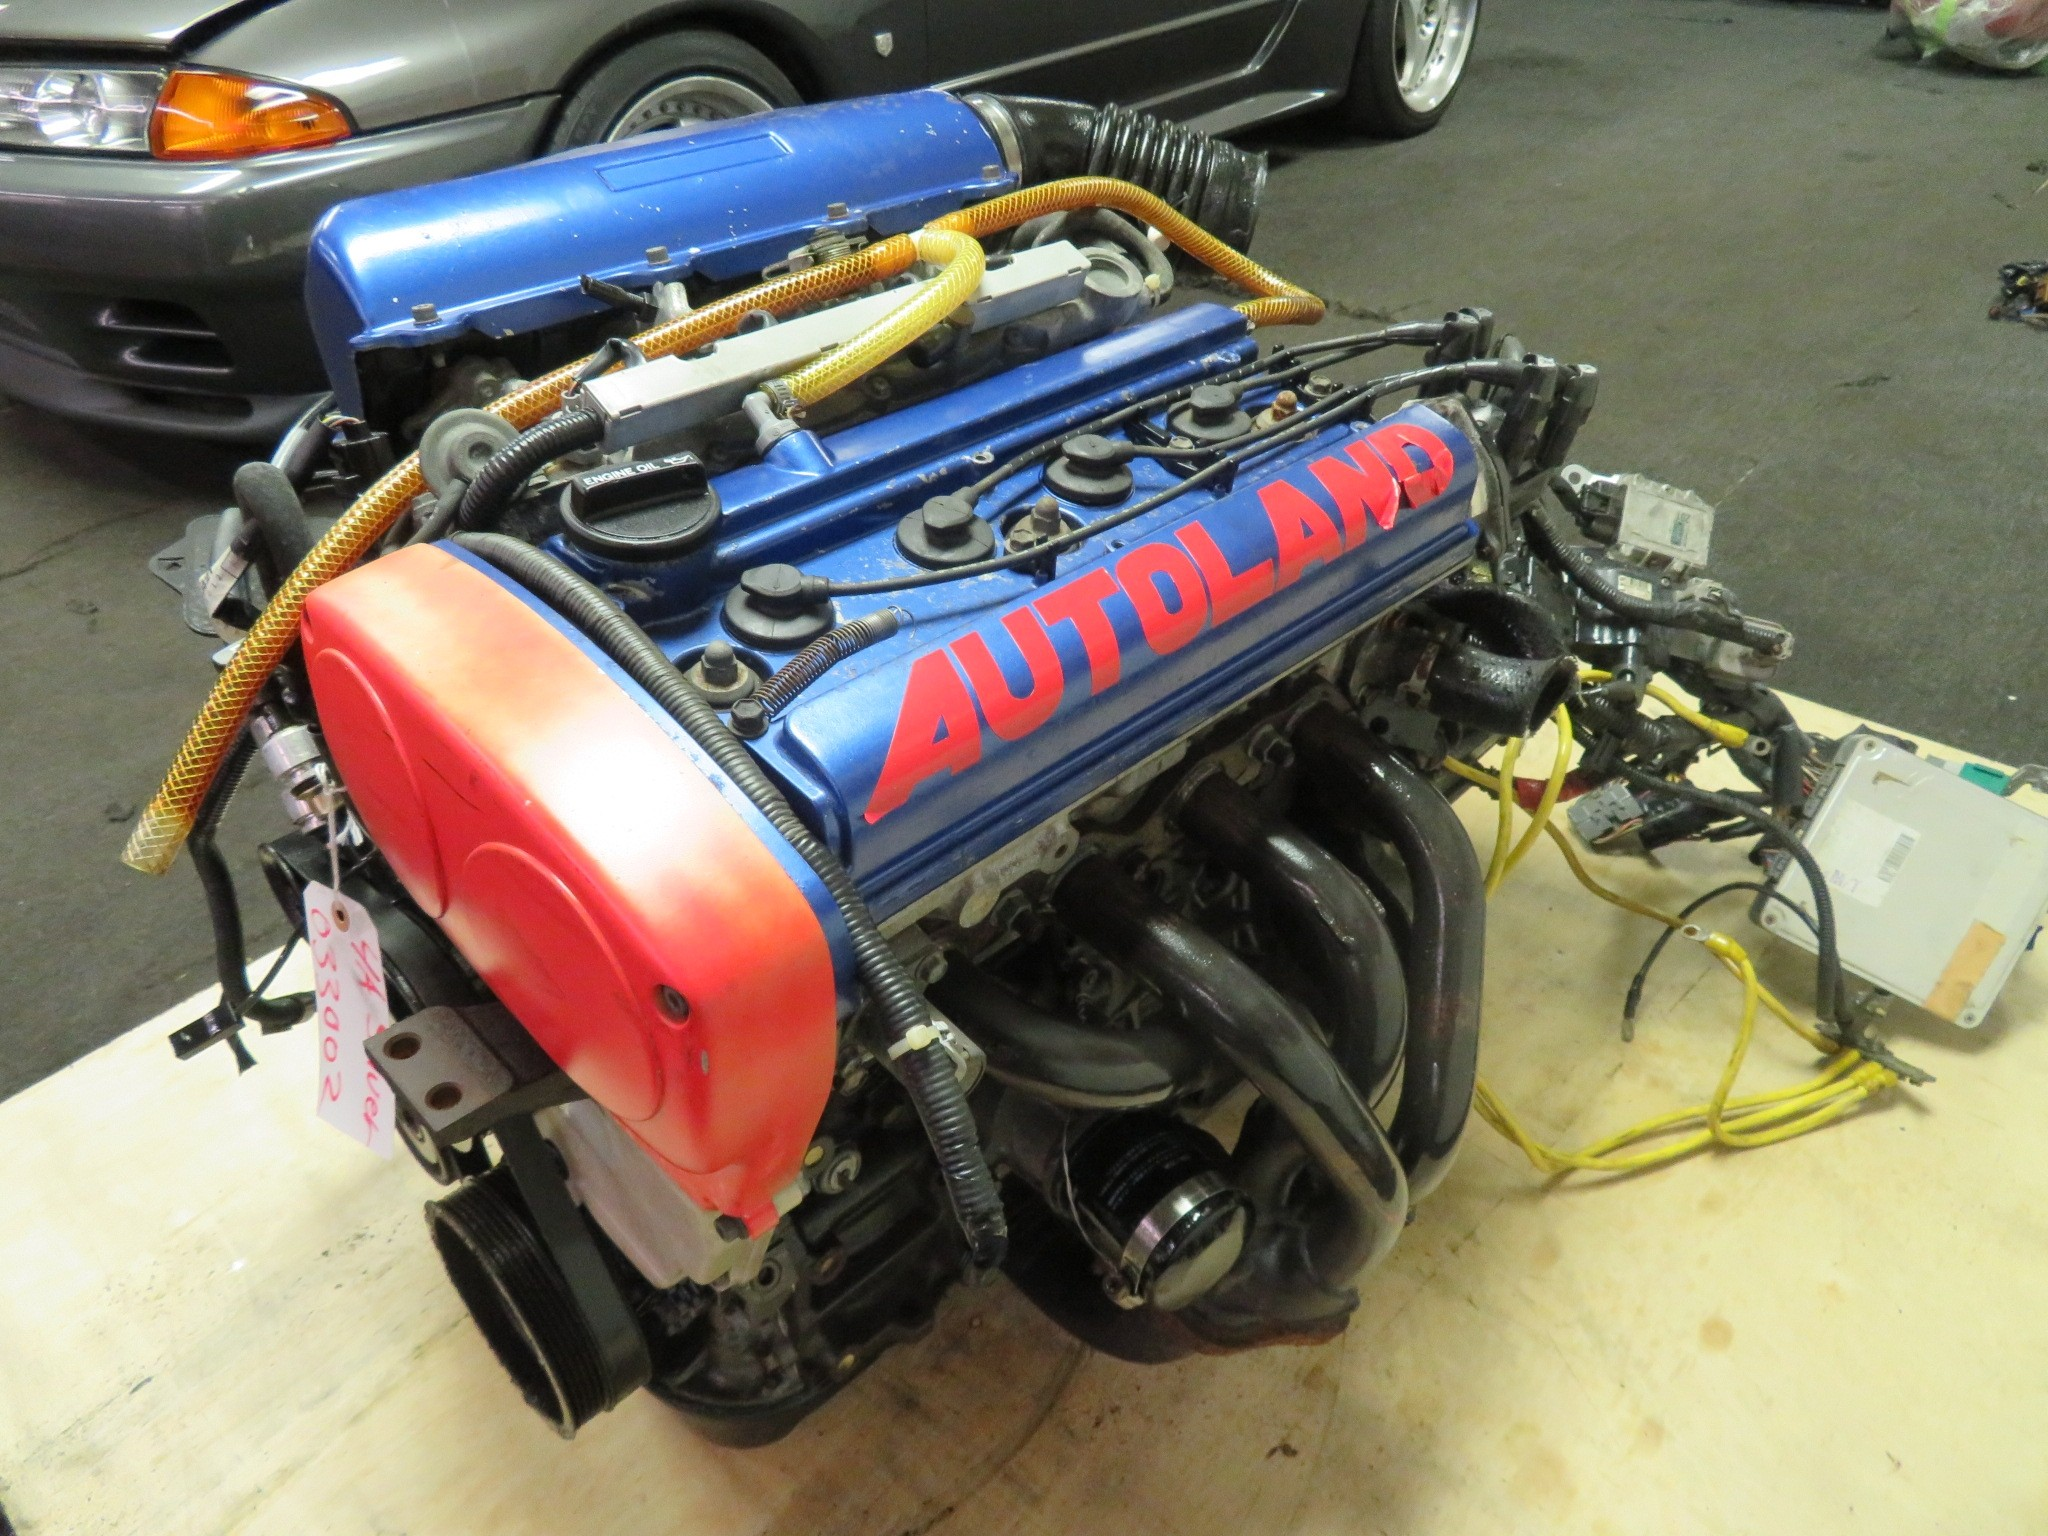 JDM TOYOTA COROLLA LEVIN 4AGE SILVERTOP TWIN CAM 20 VALVE ENGINE, 5 SPEED TRANSMISSION